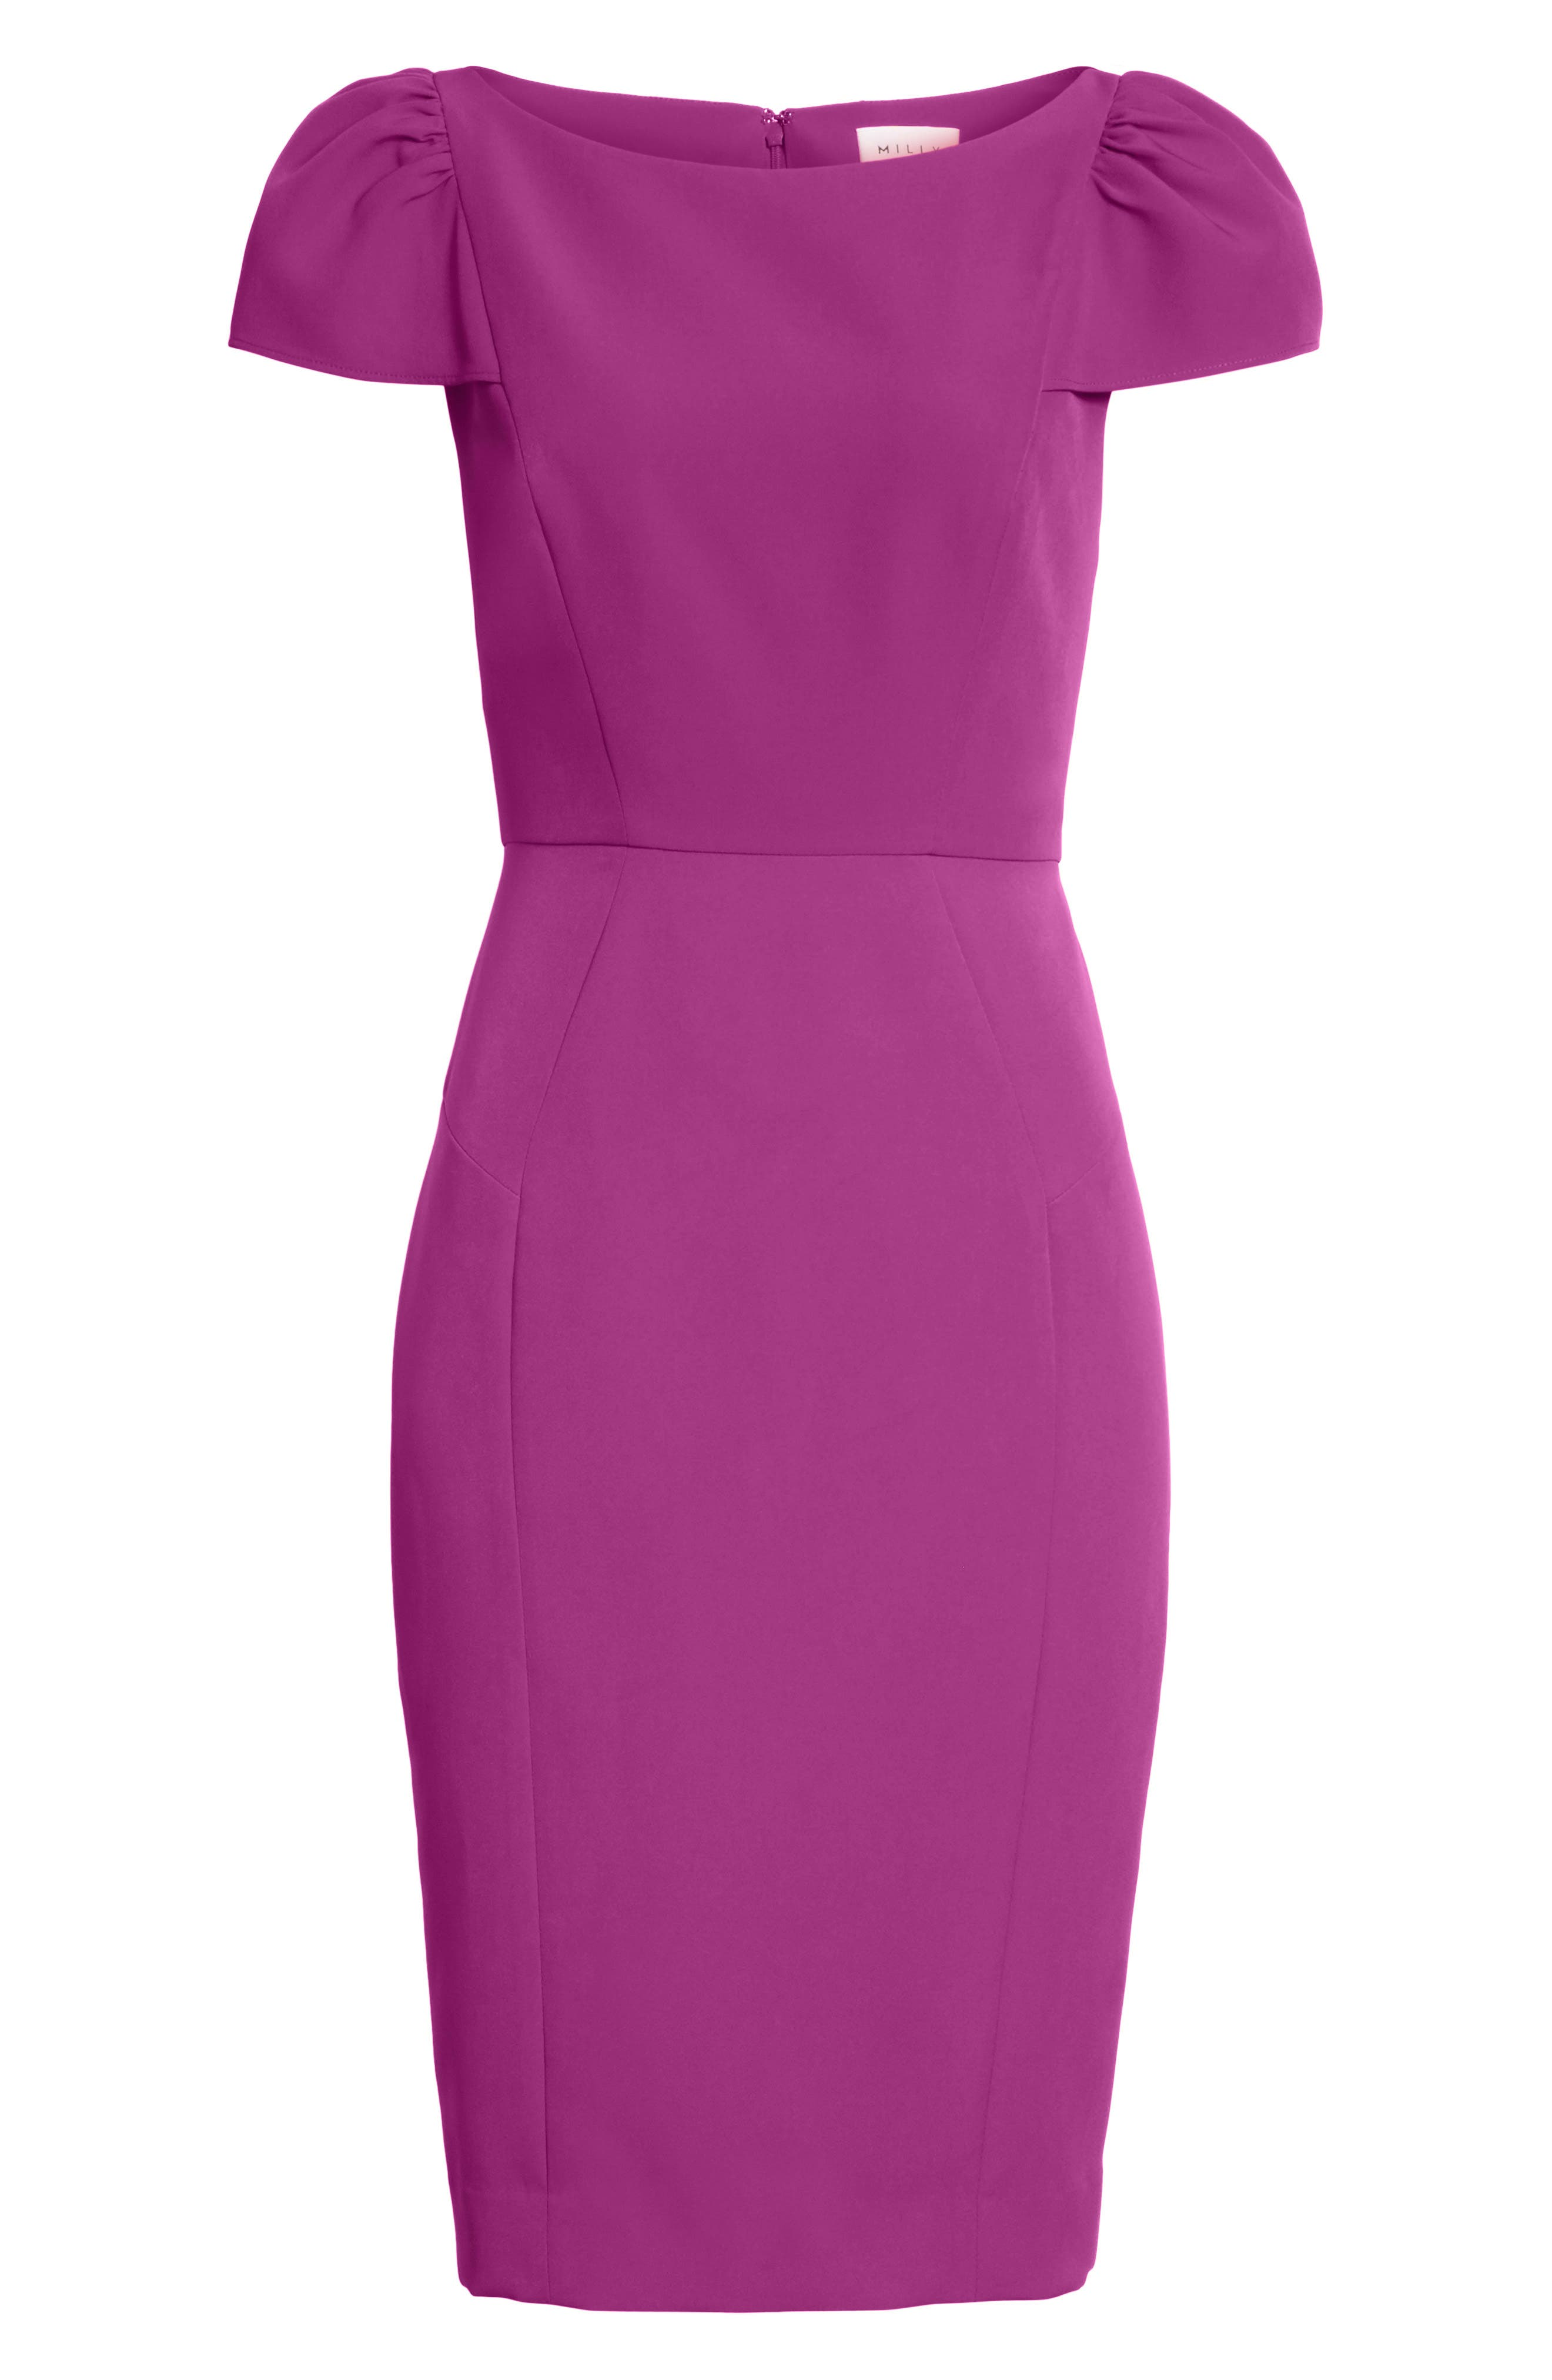 Italian Cady Gathered Sleeve Sheath Dress,                             Alternate thumbnail 7, color,                             569